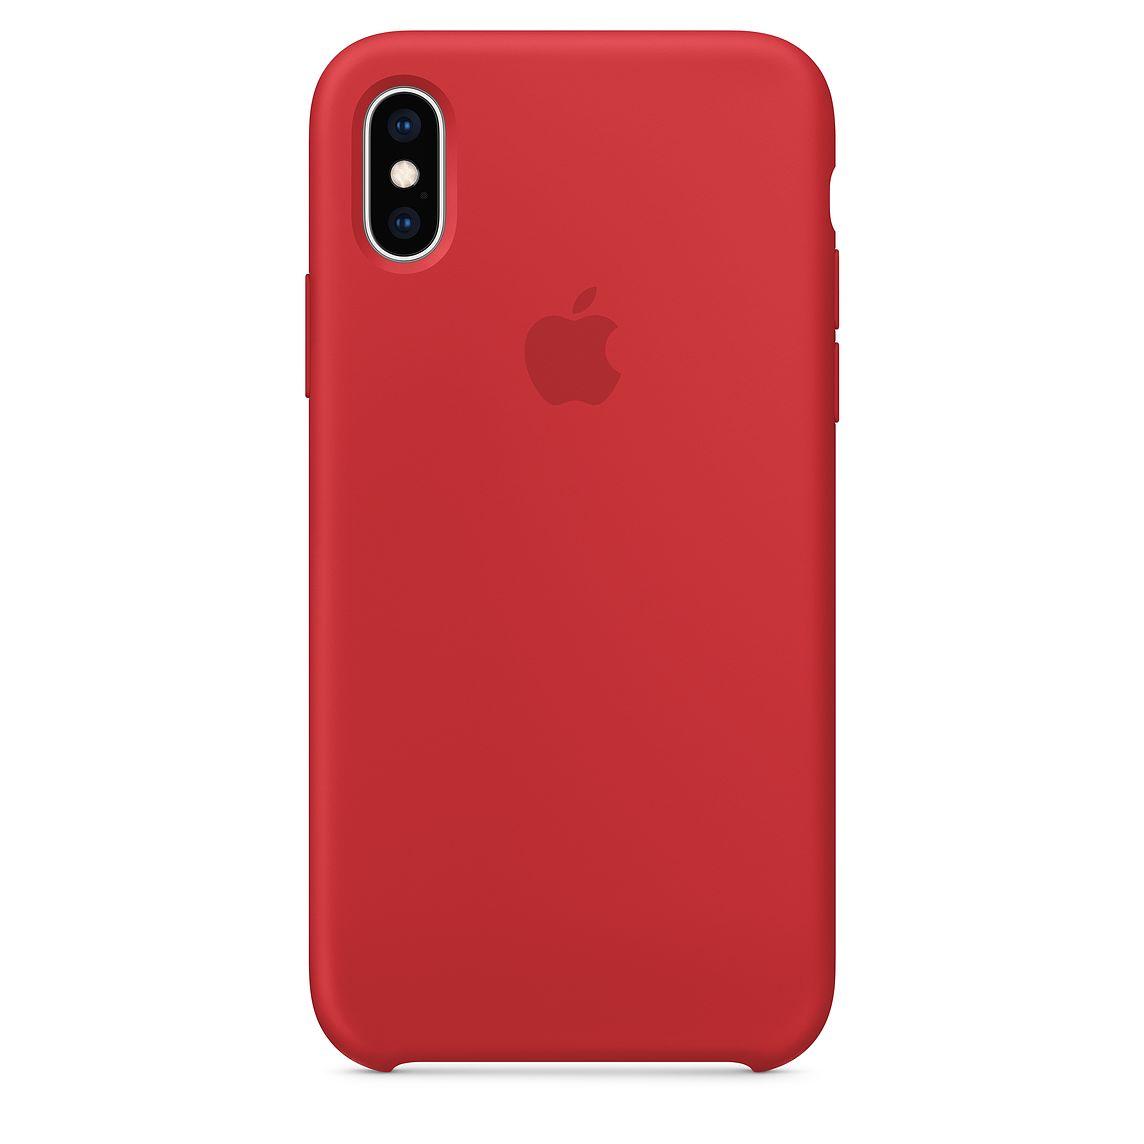 Купить Чехол-накладка Apple Silicone Case Series для iPhone XS силикон (PRODUCT) Red (MRWC2ZM/A)